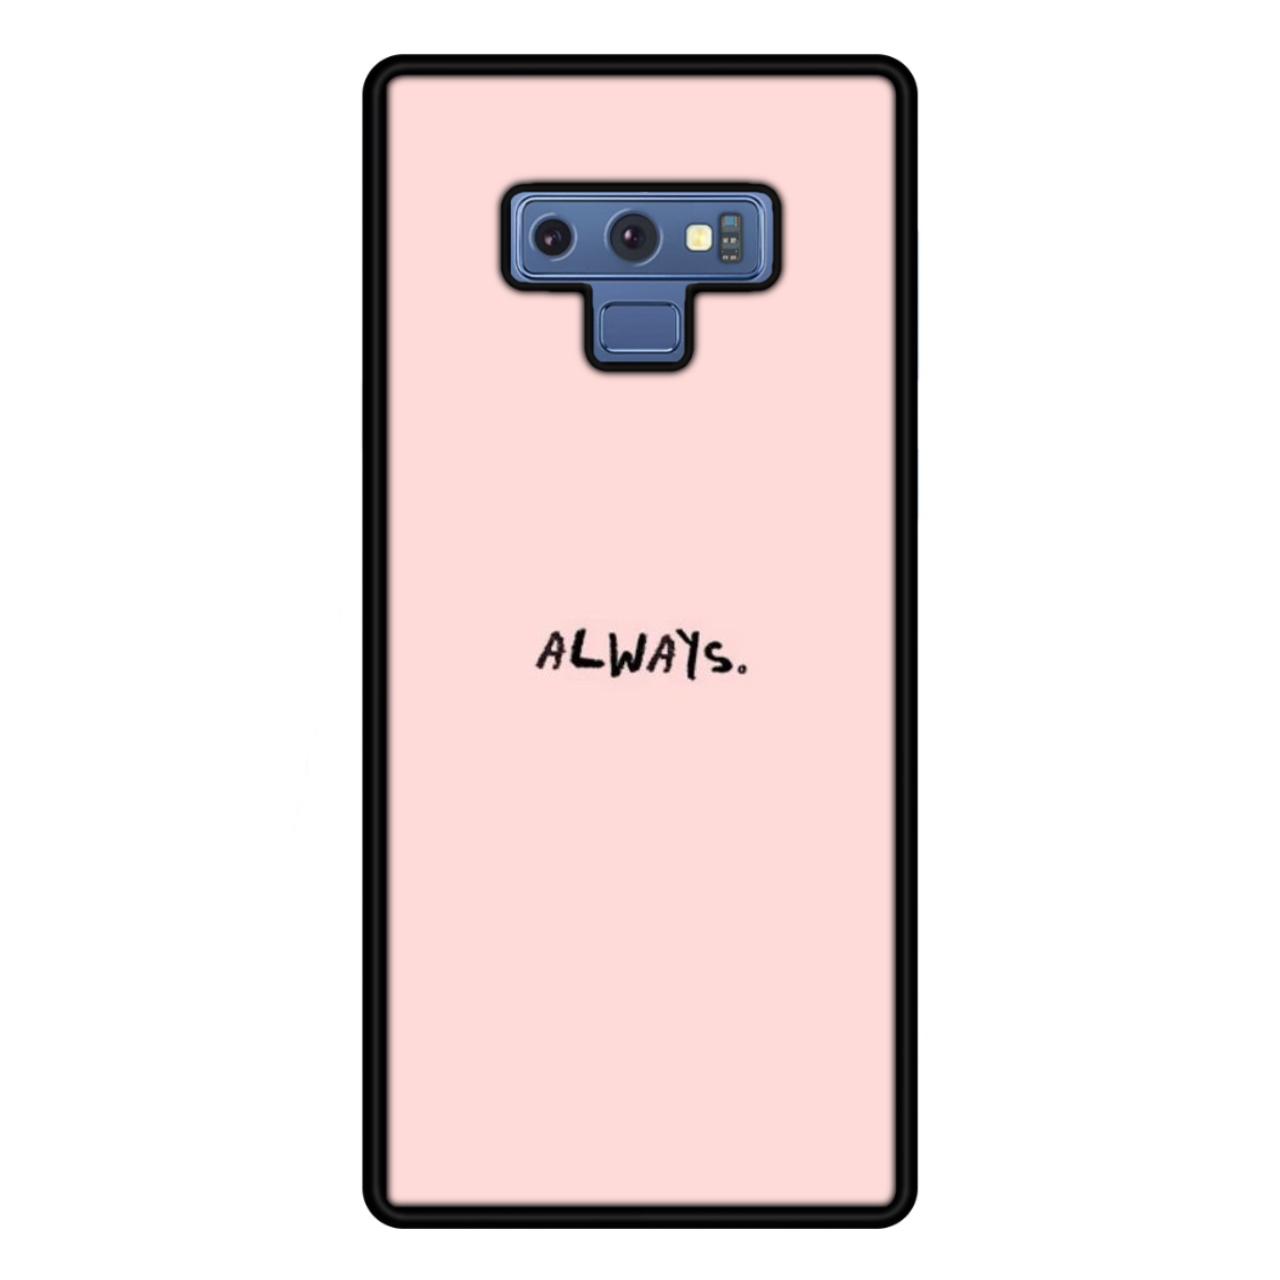 کاور آکام مدل AN90967 مناسب برای گوشی موبایل سامسونگ Galaxy Note 9